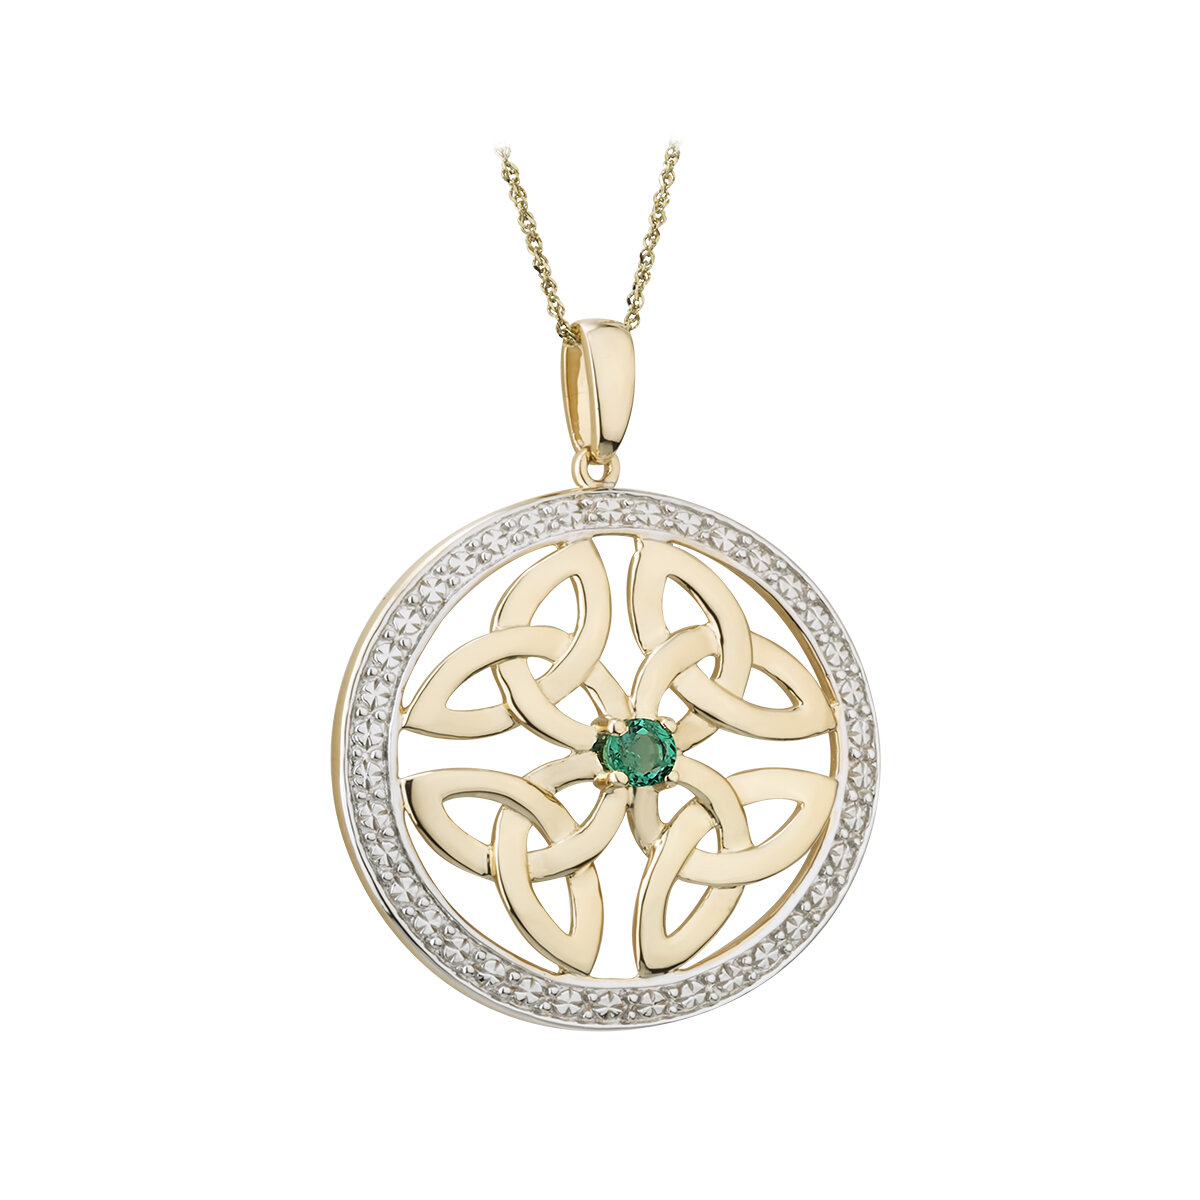 14k gold emerald round trinity knot pendant s46403 from Solvar